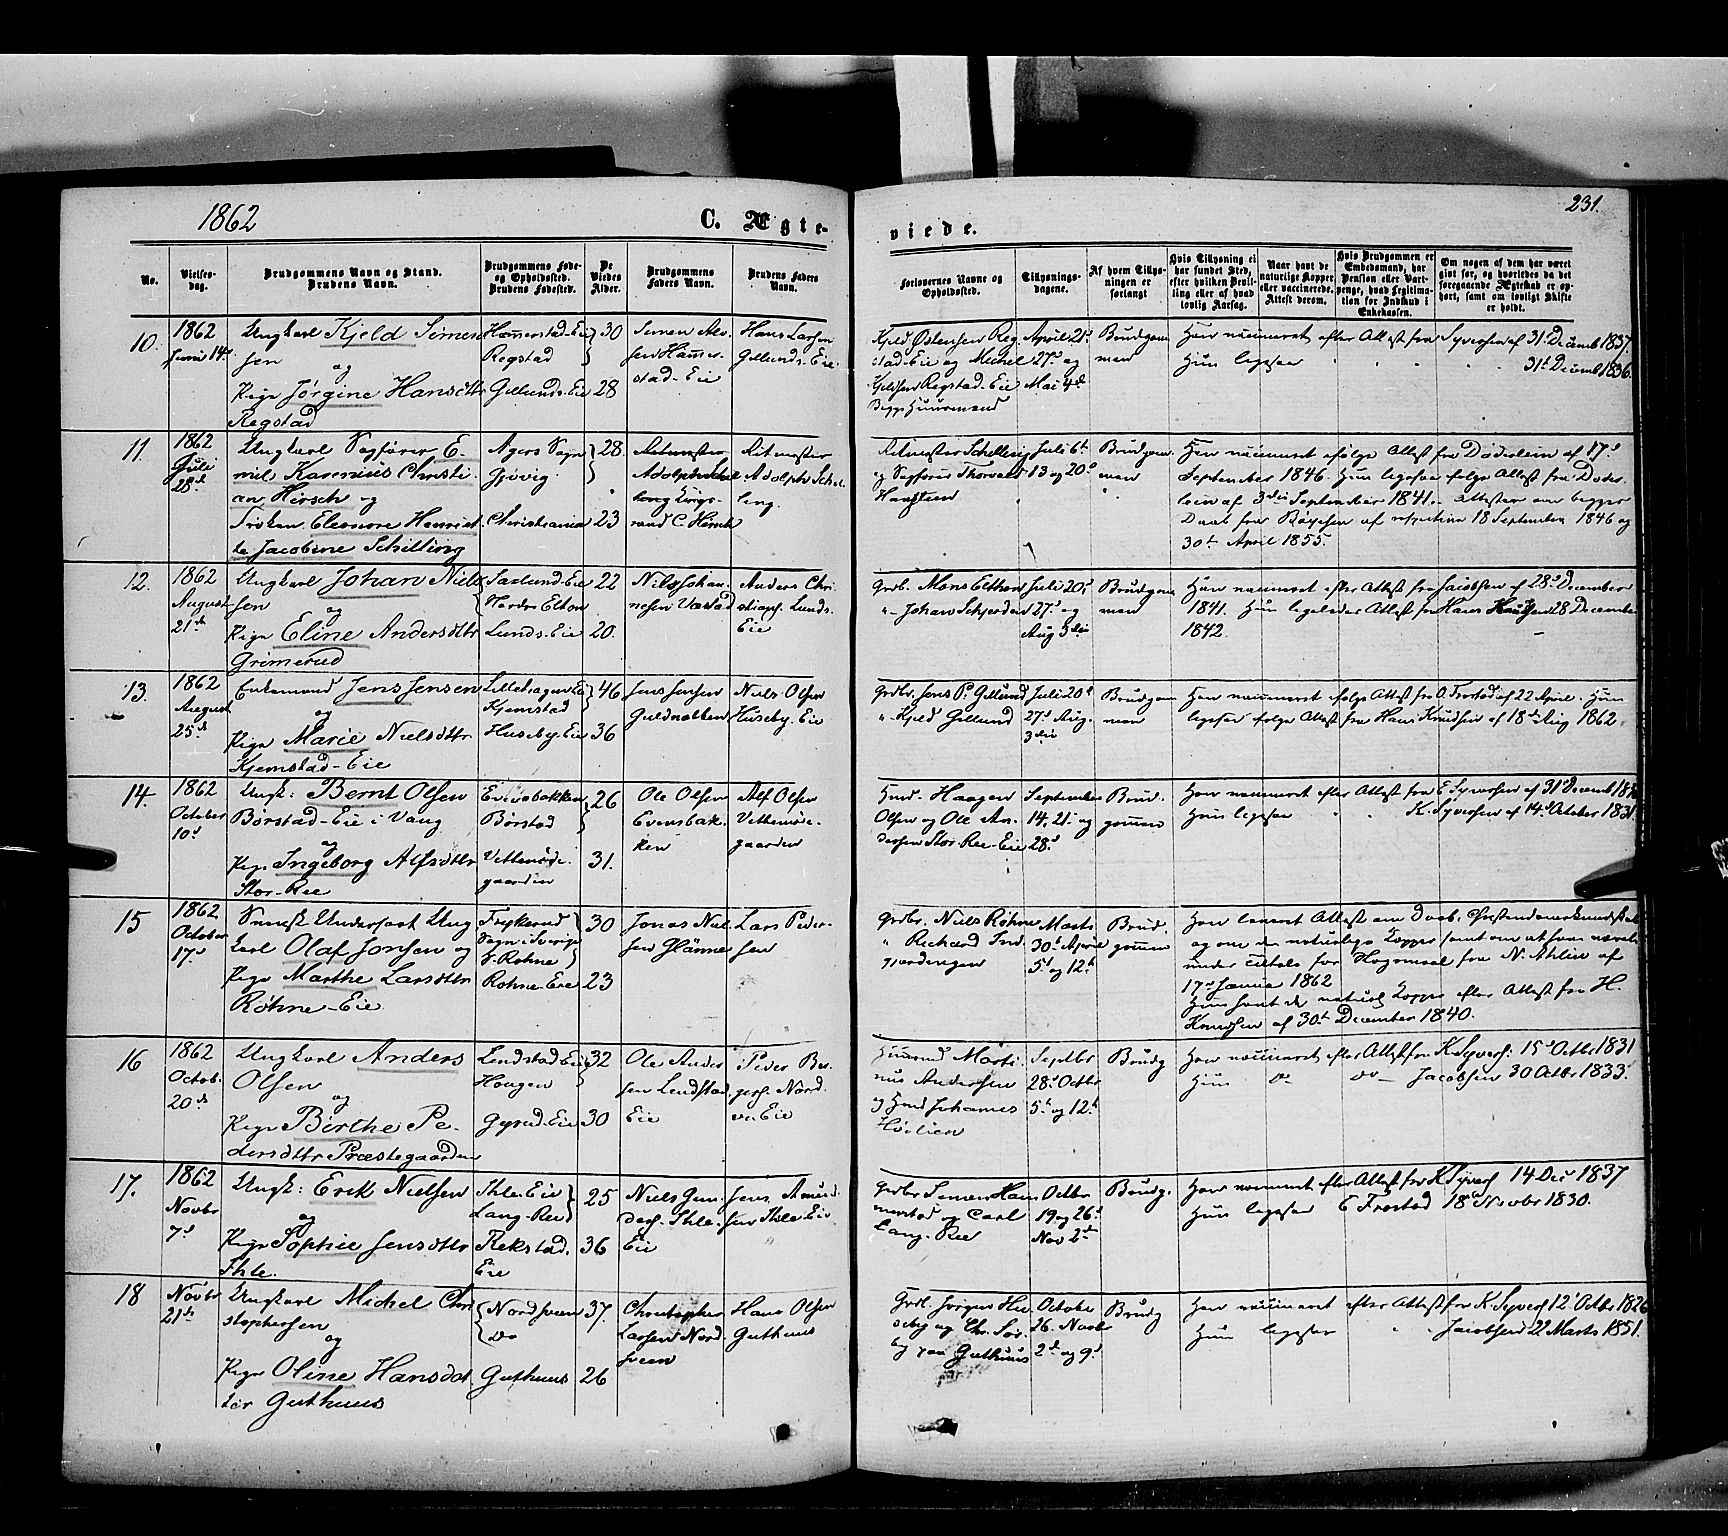 SAH, Stange prestekontor, K/L0013: Ministerialbok nr. 13, 1862-1879, s. 231